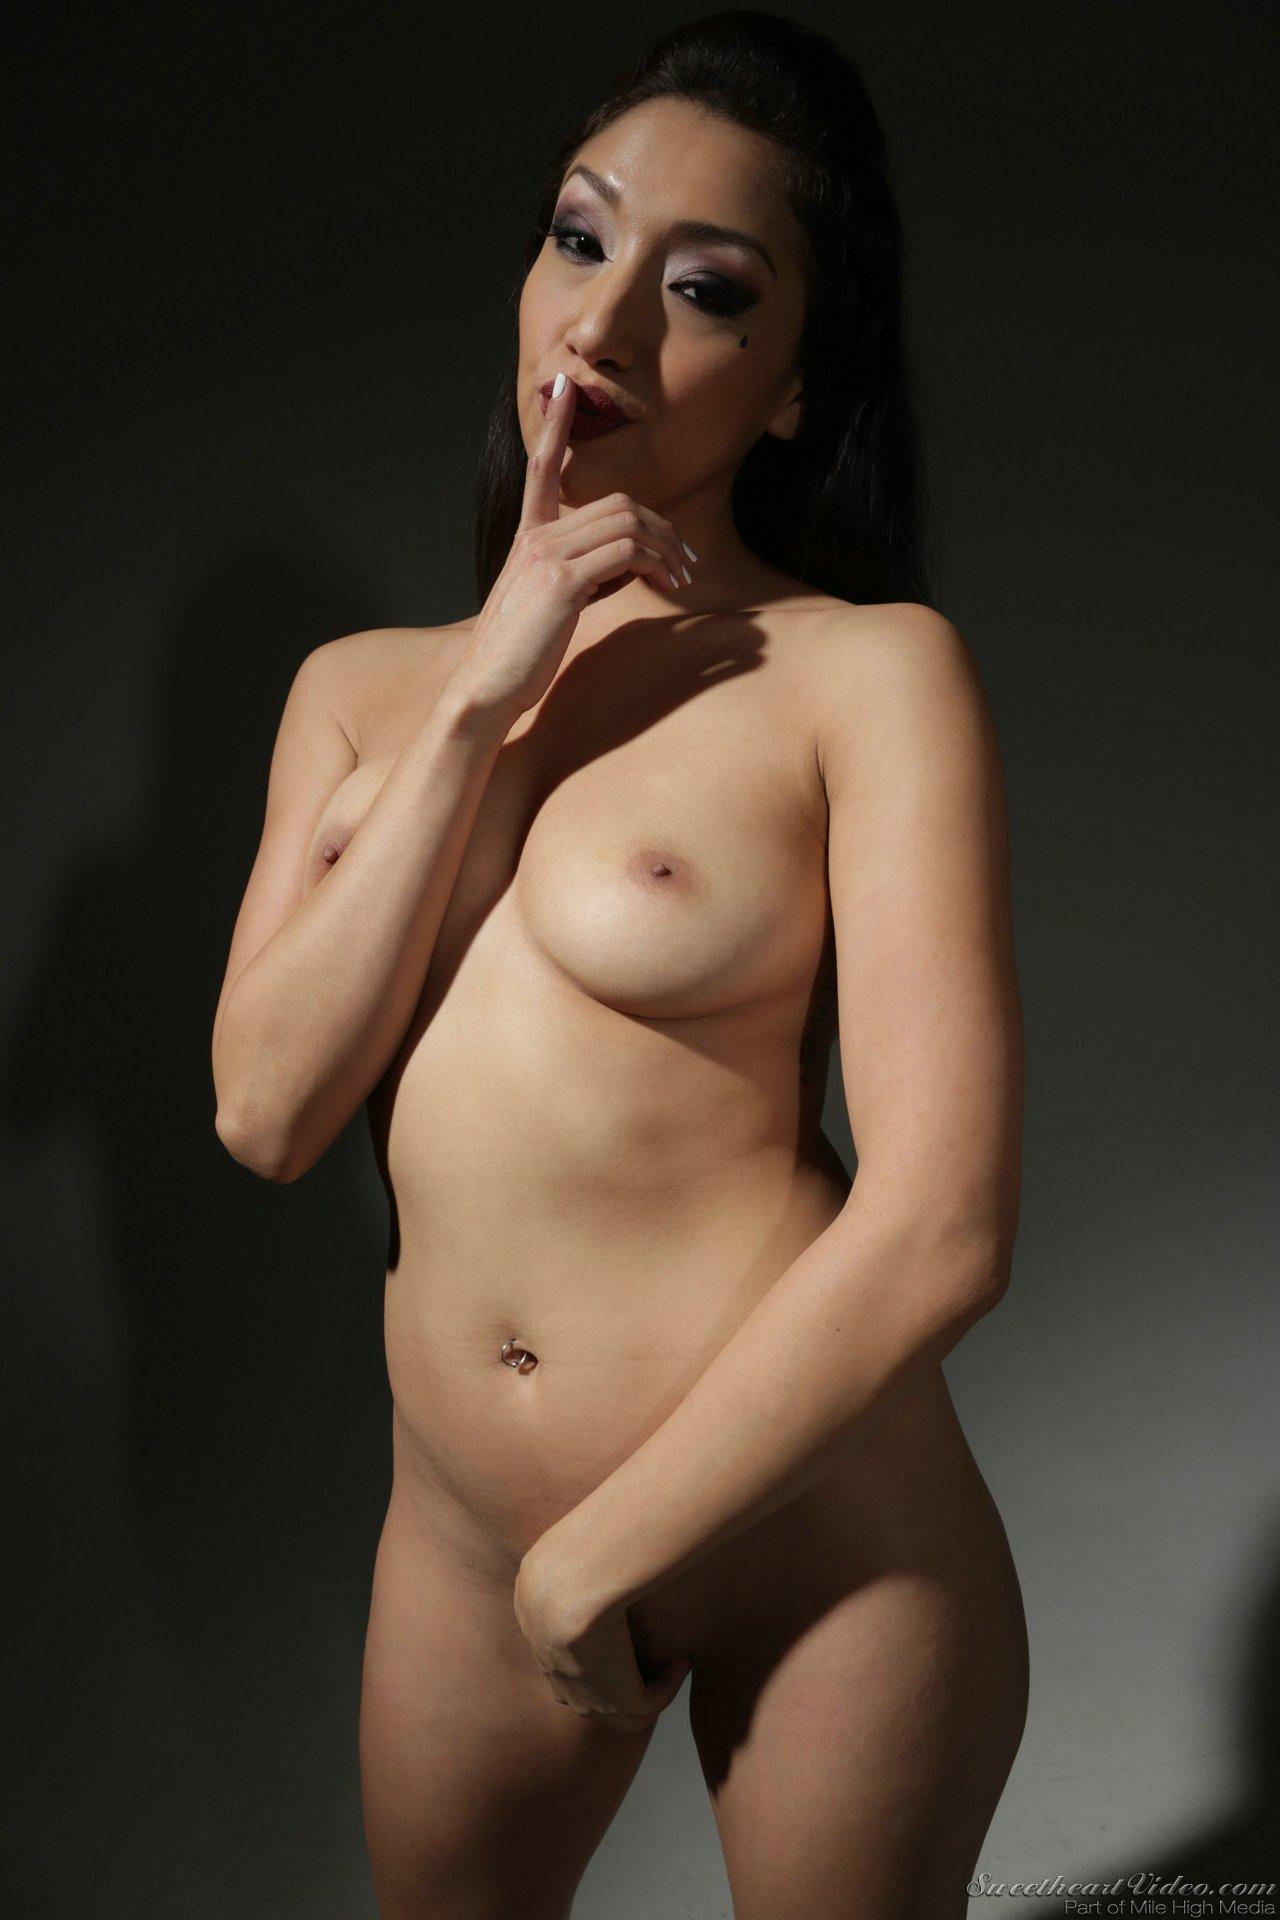 Vicki chase naked